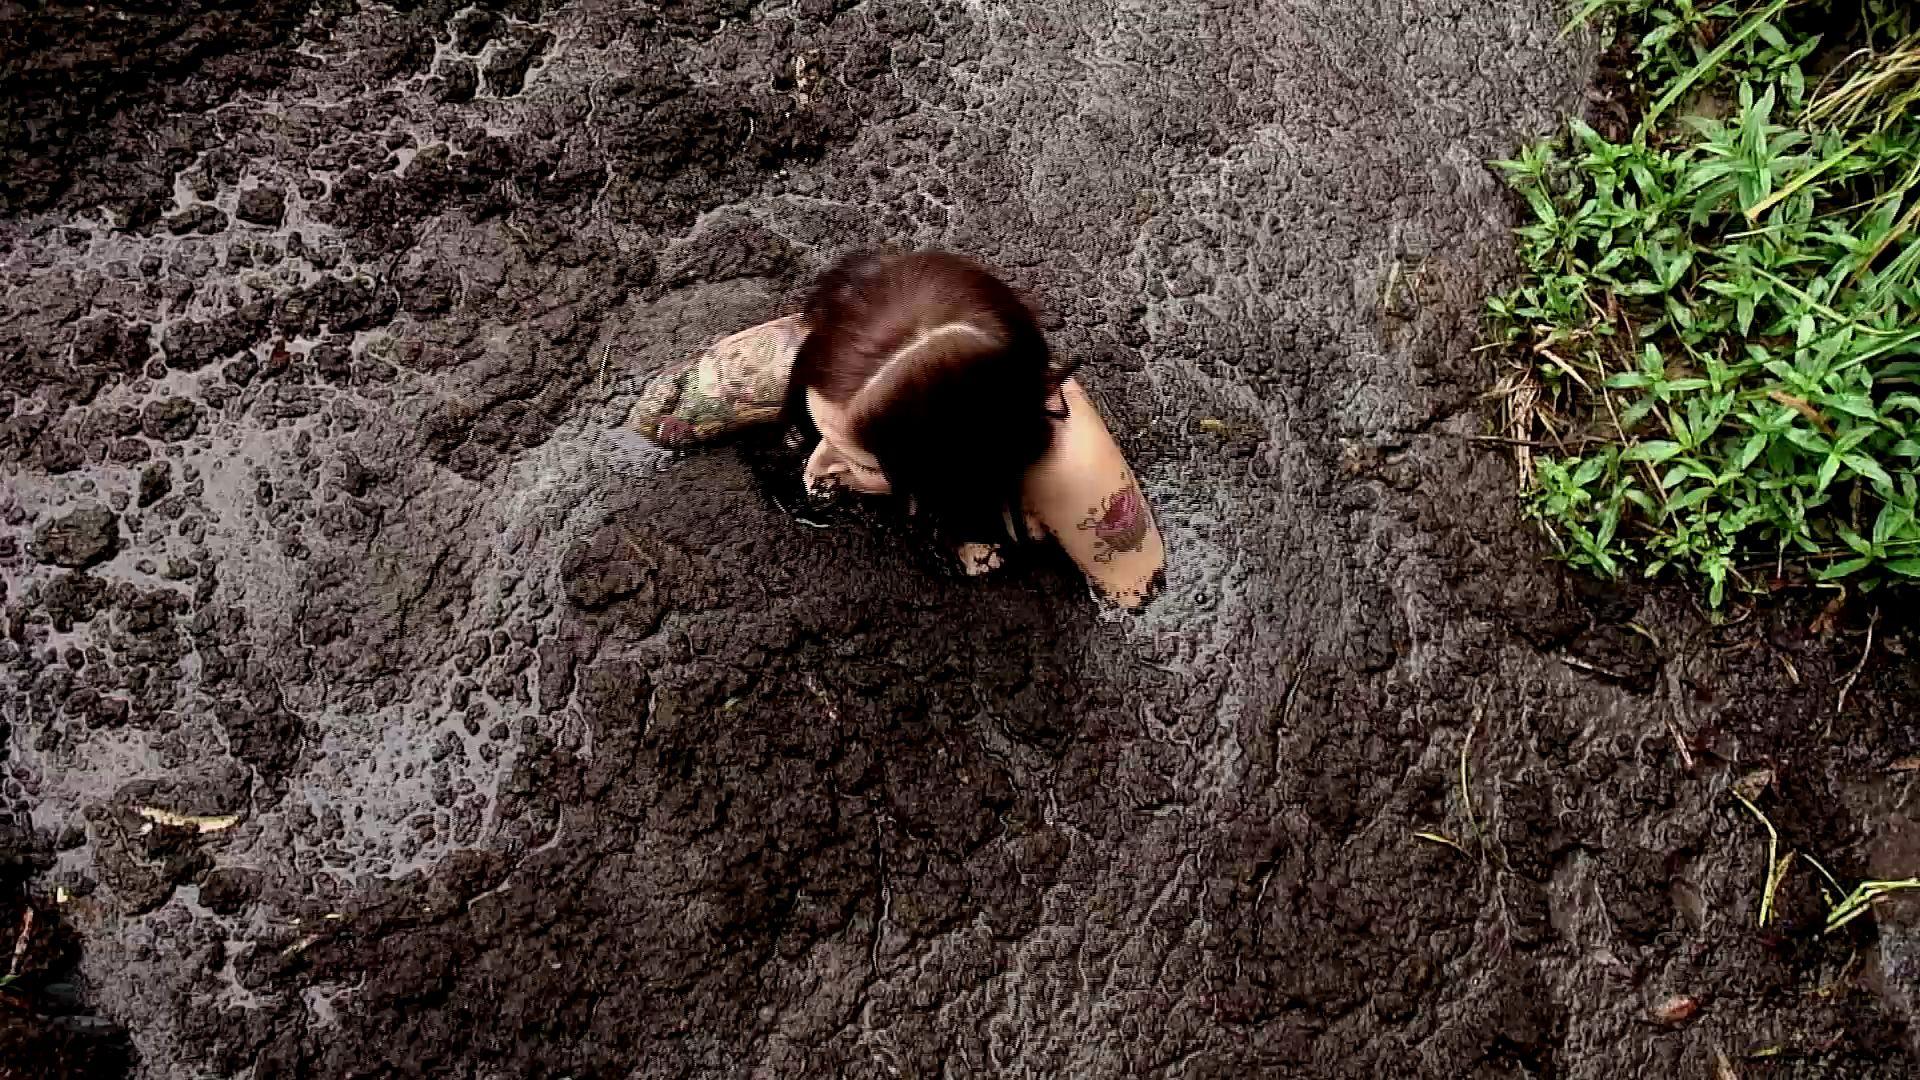 Paris Kennedy quicksand Paris-sinking-solo-in-the-bog_18